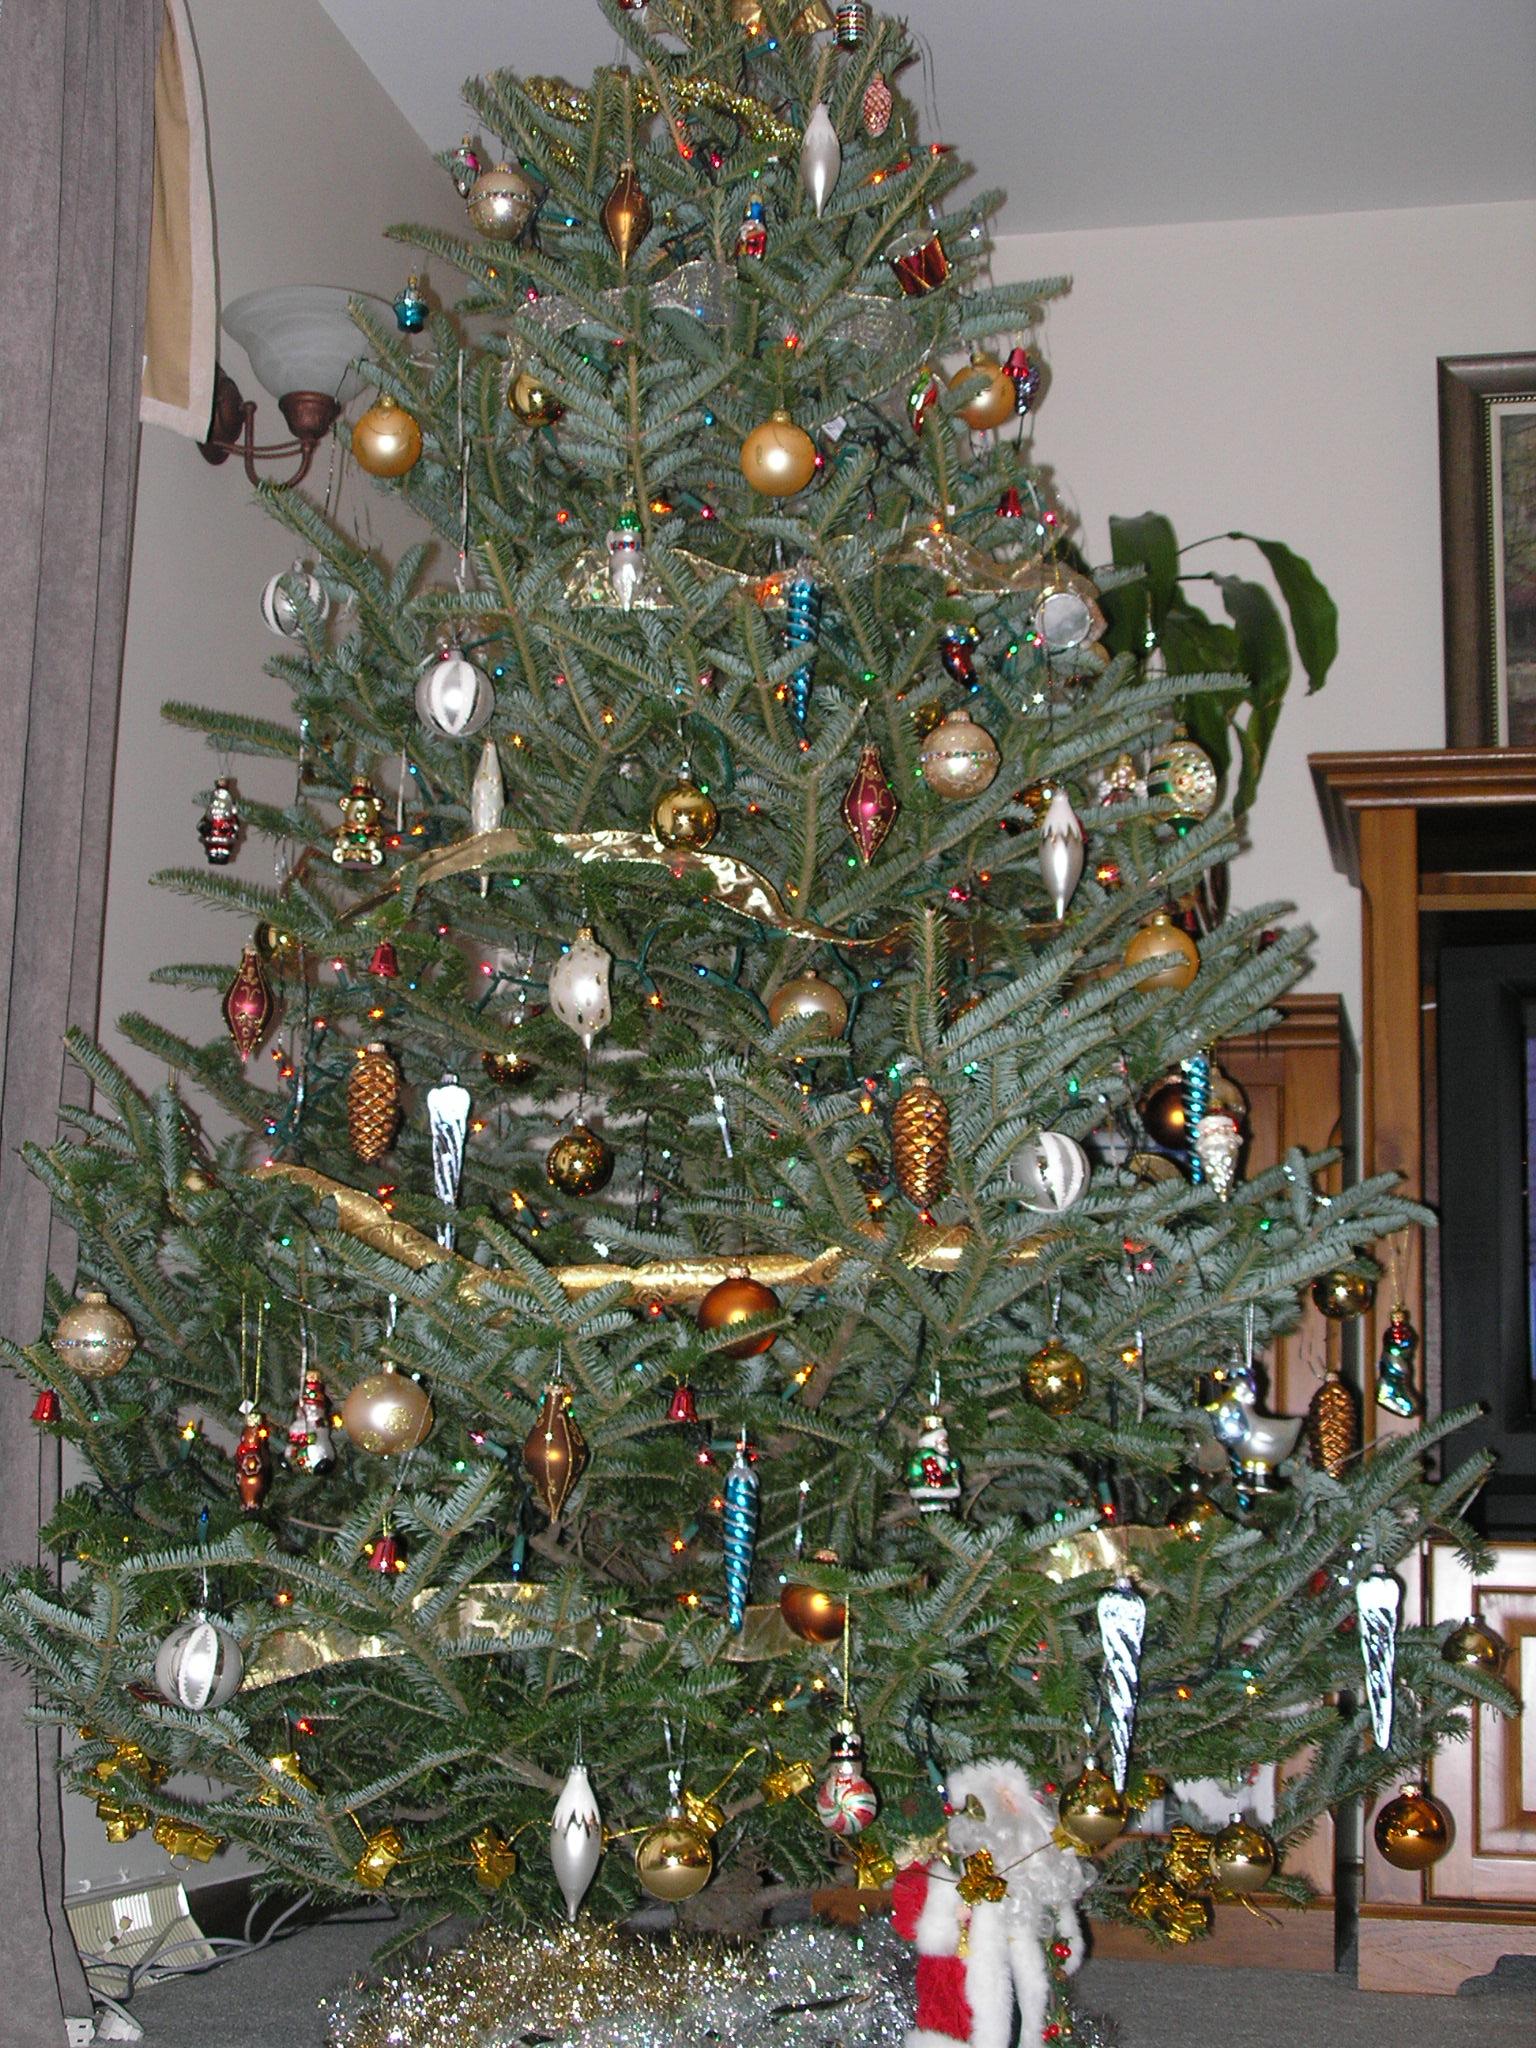 filechristmas tree ddimajpg wikimedia commons